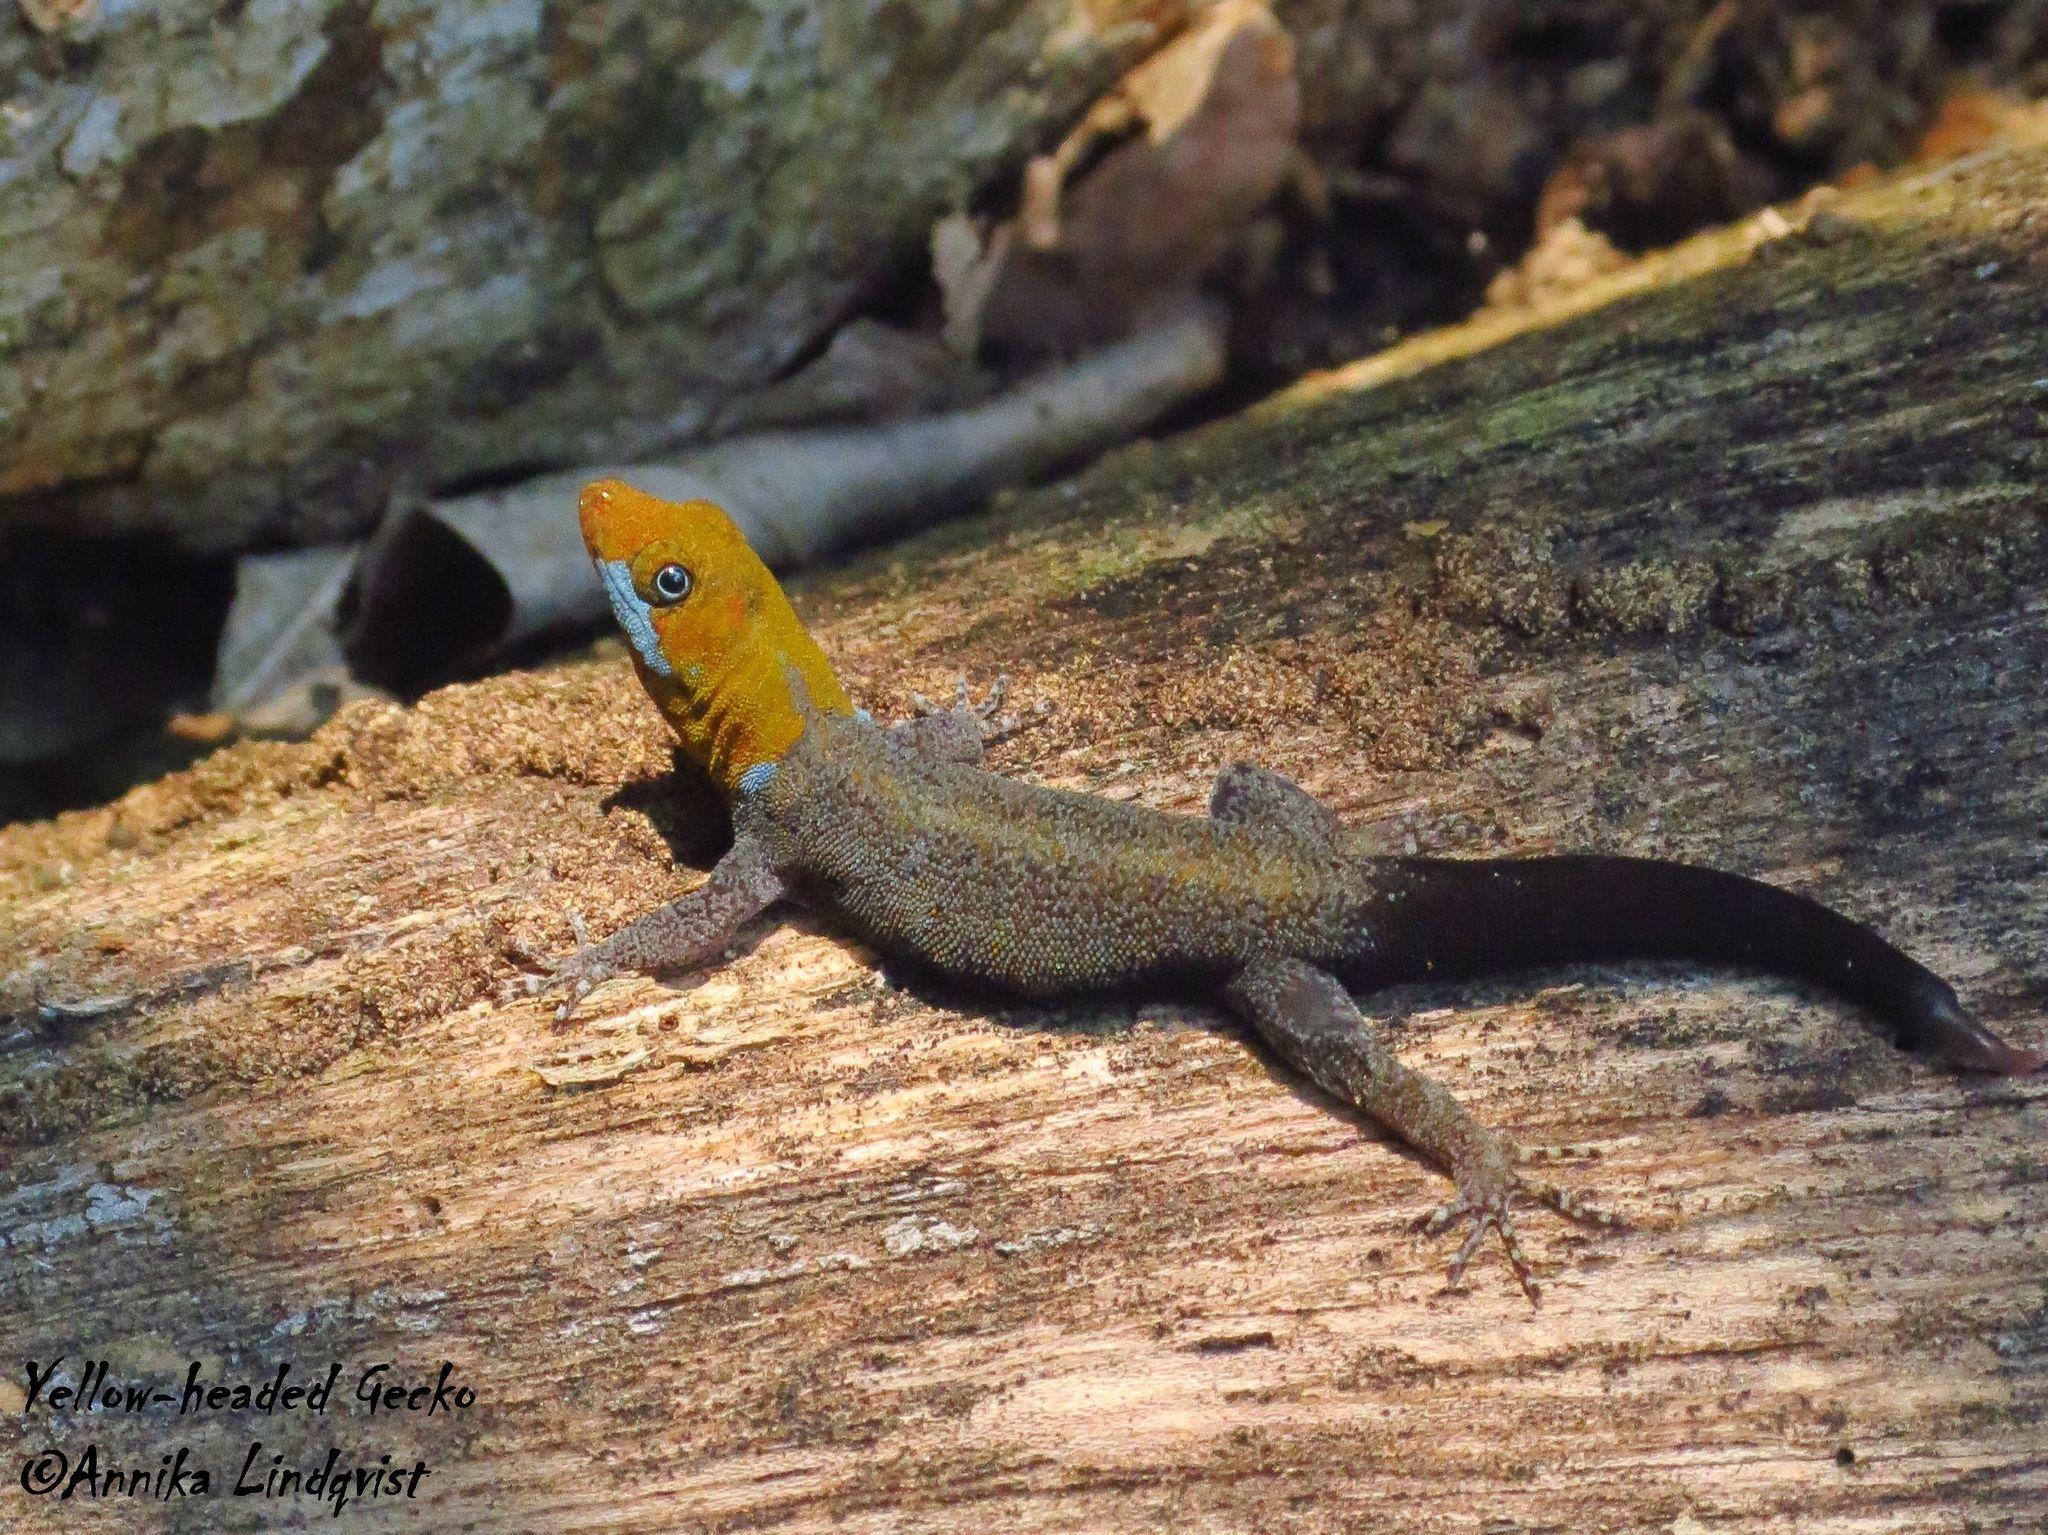 Image of Yellowhead gecko